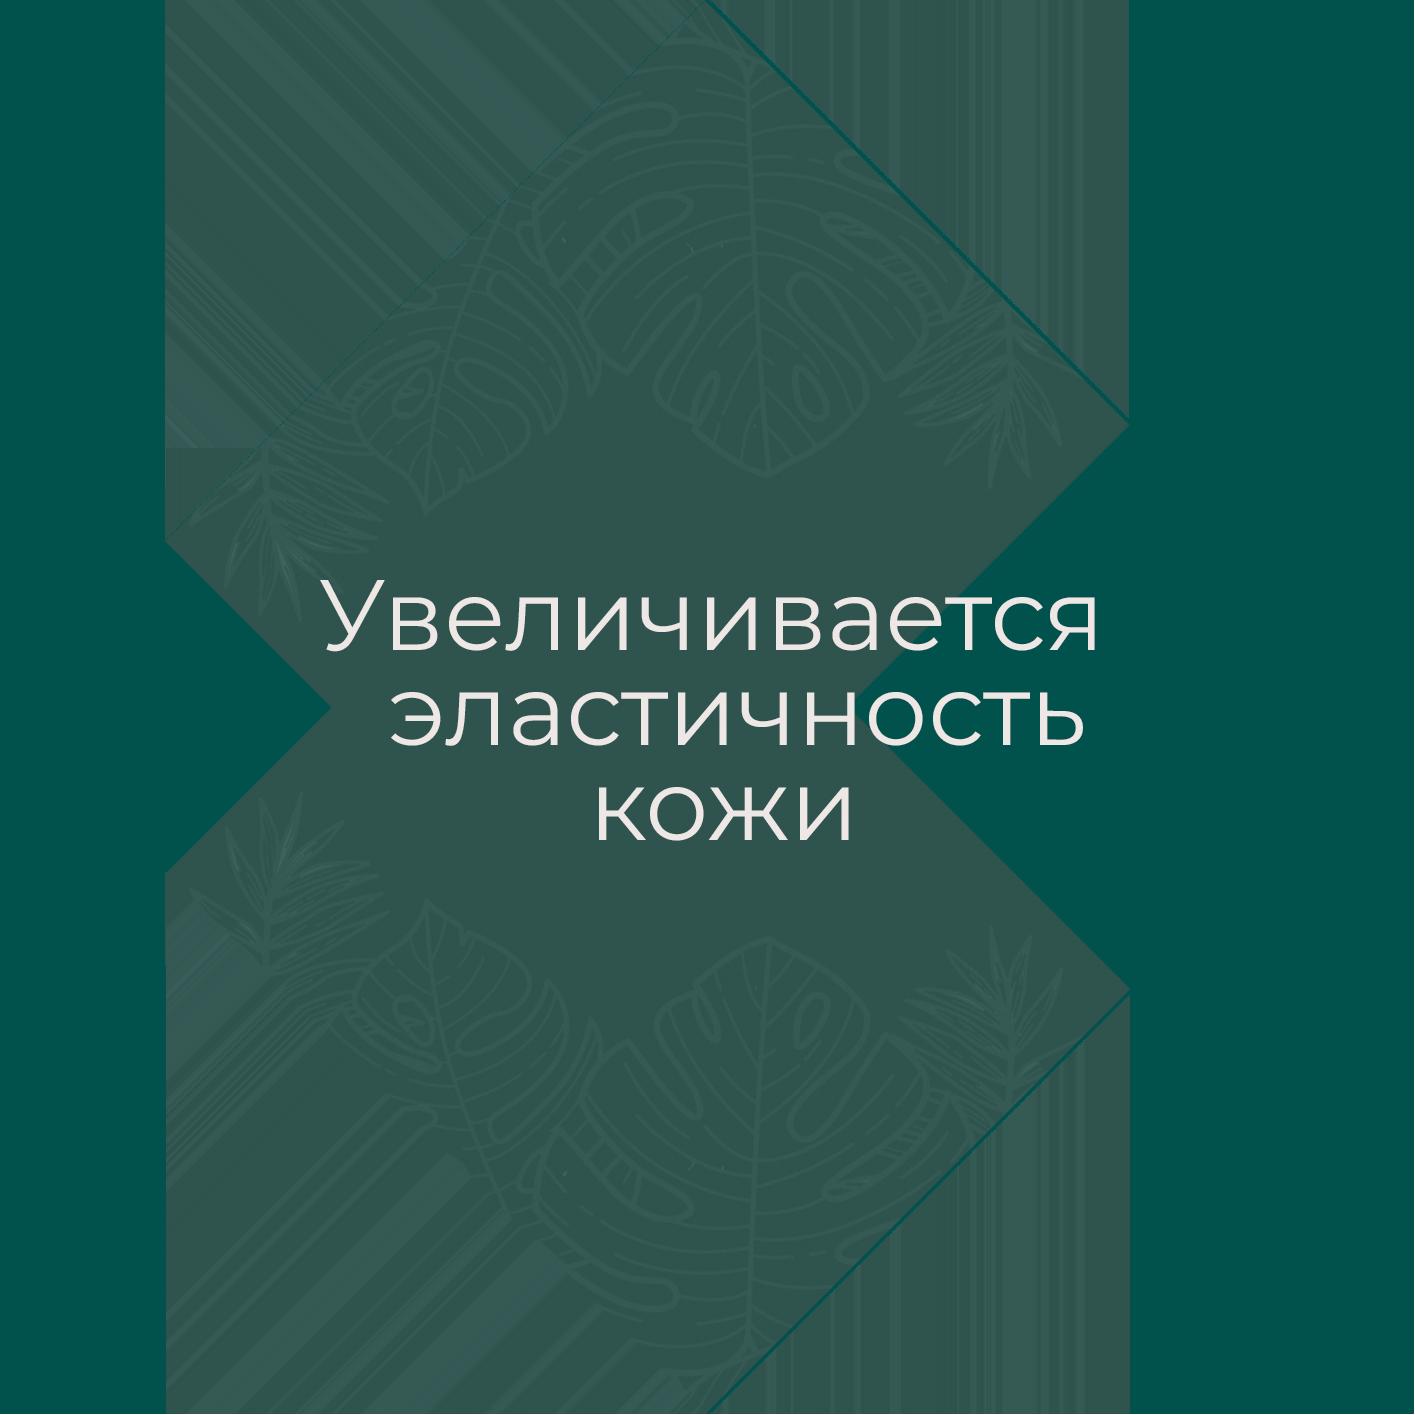 кк (2)